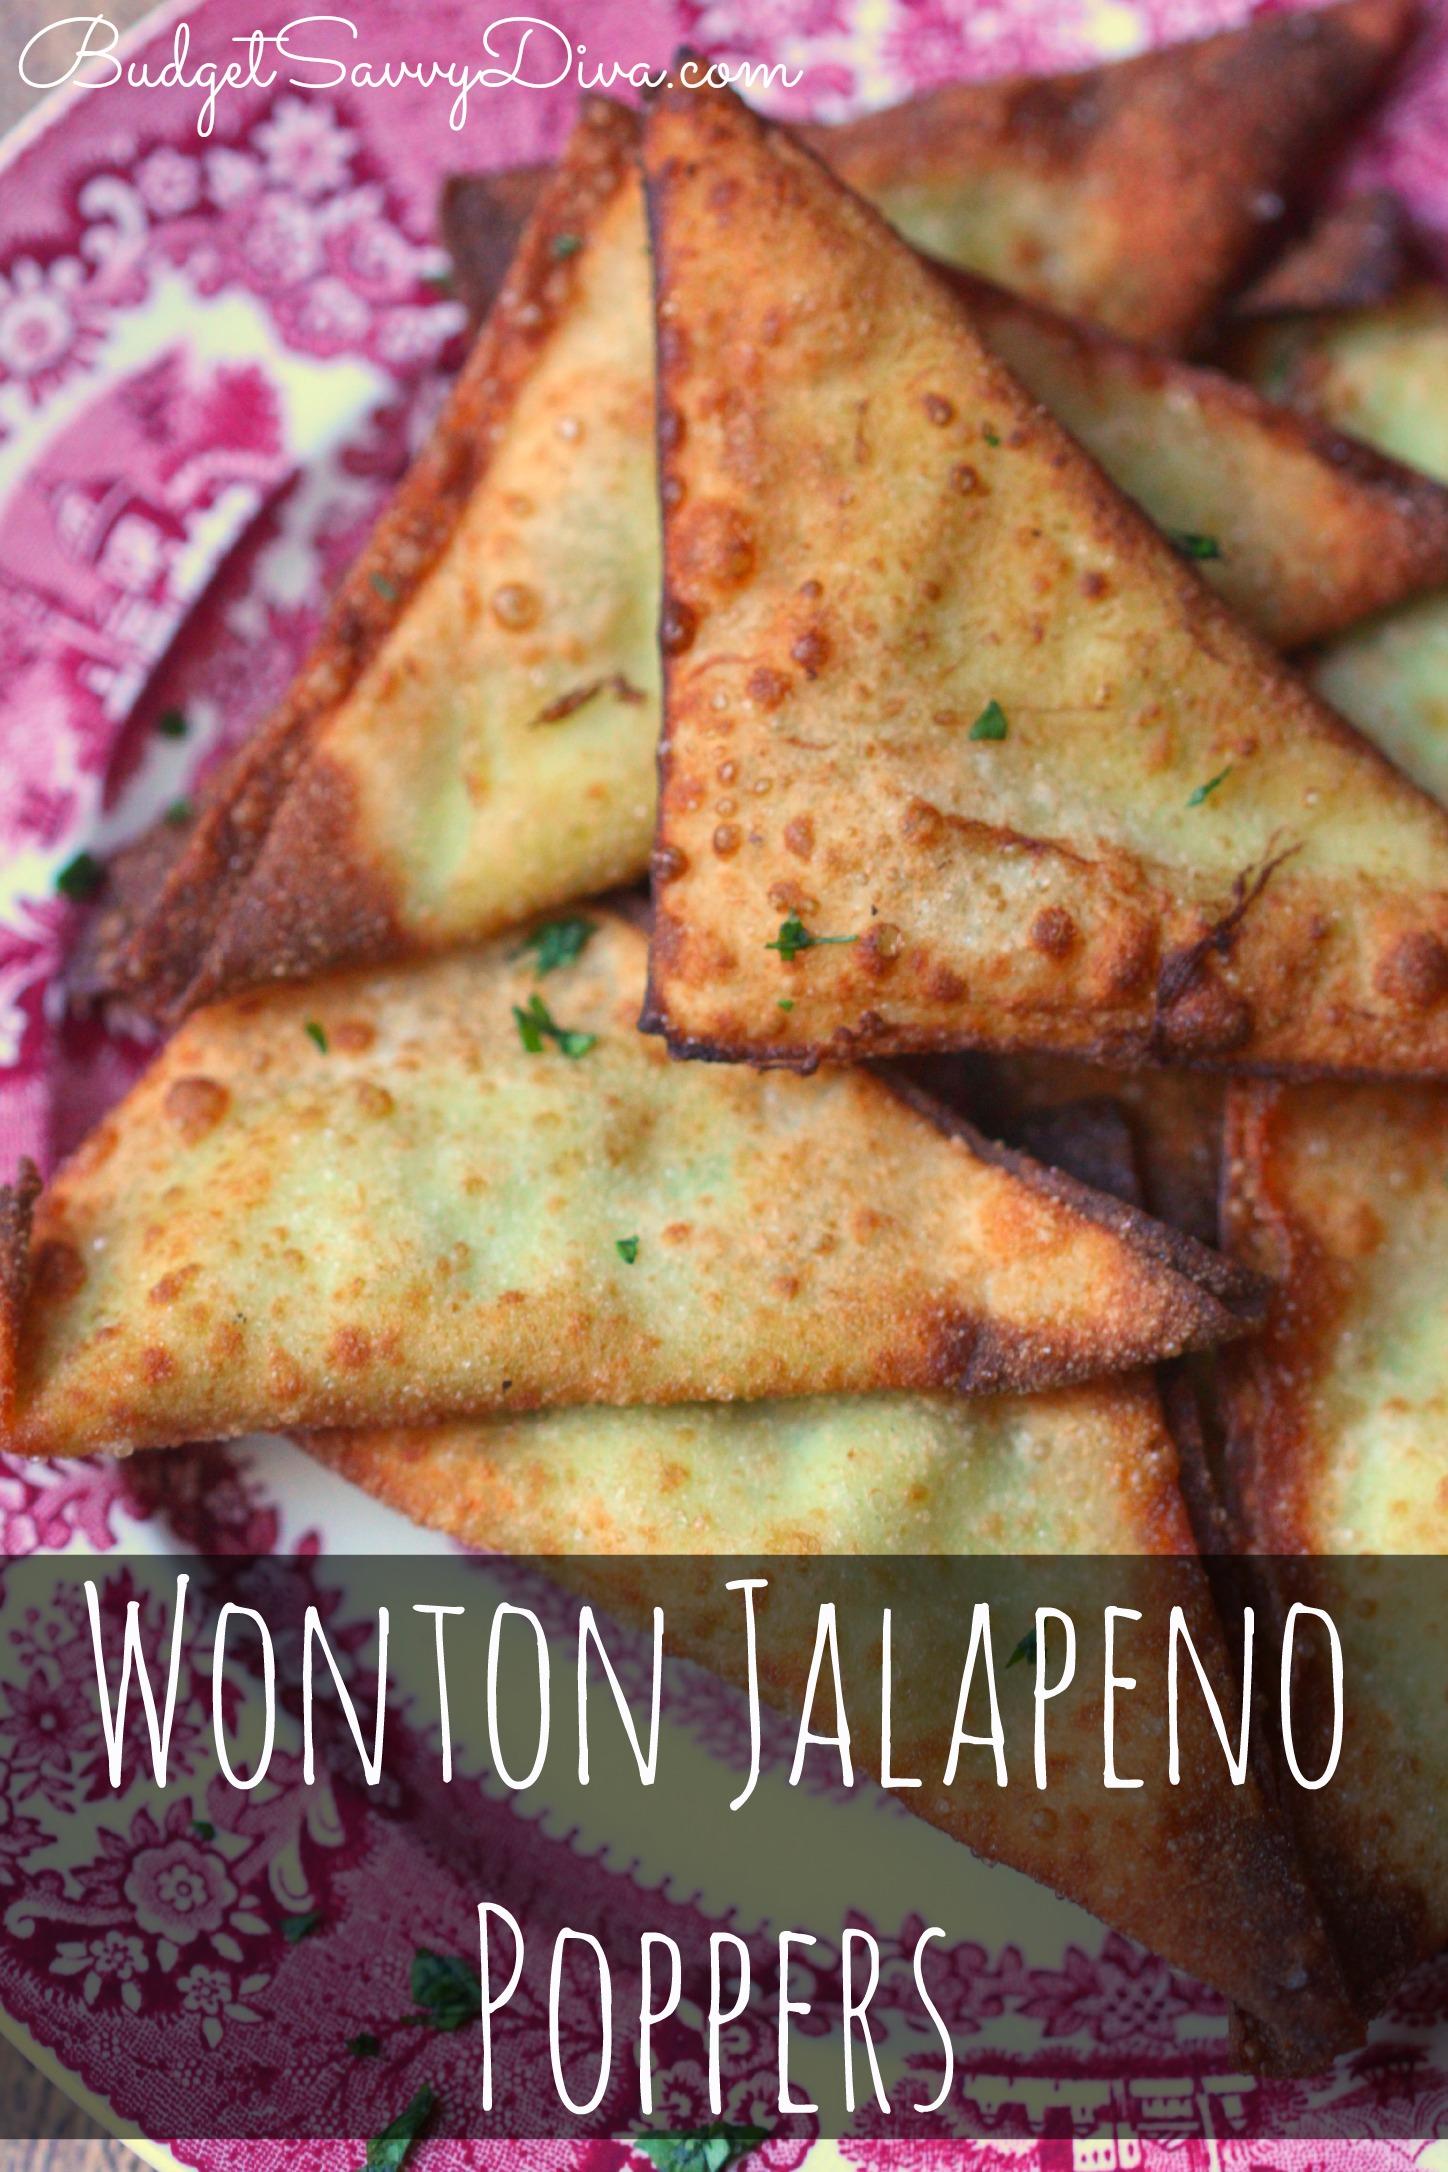 Wonton Jalapeno Poppers Recipe | Budget Savvy Diva